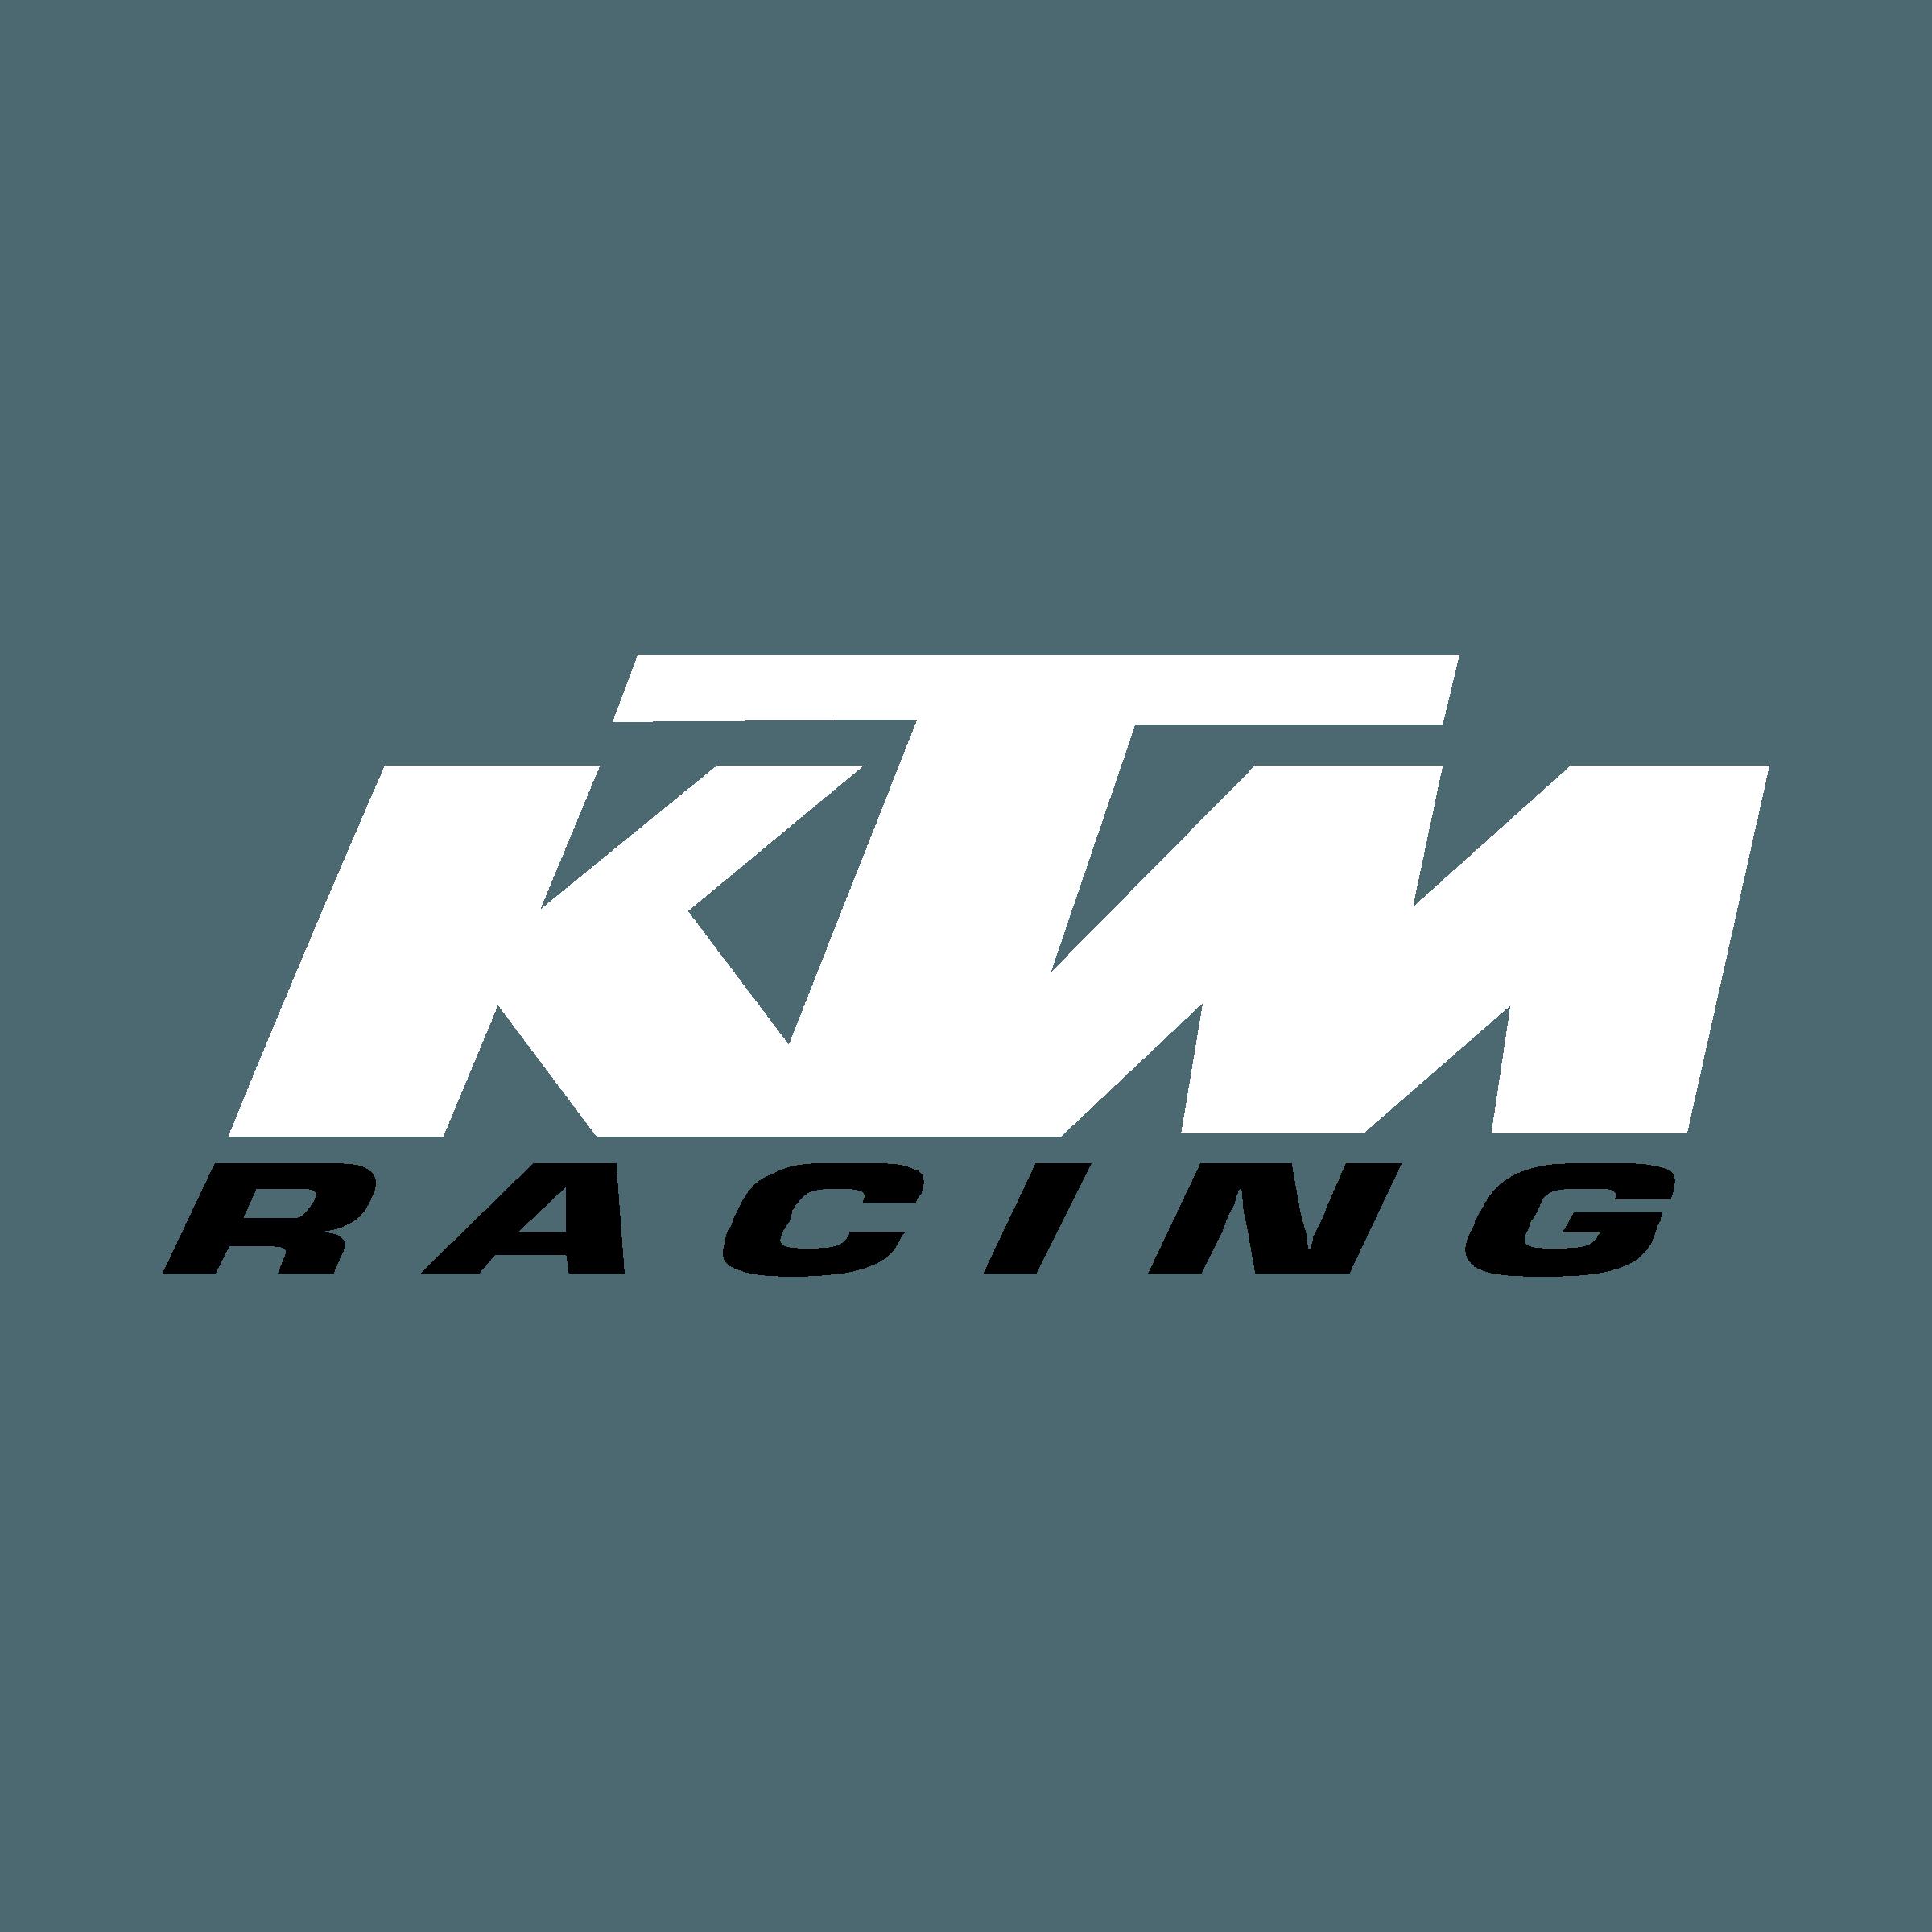 Ktm Racing Logo - Pluspng